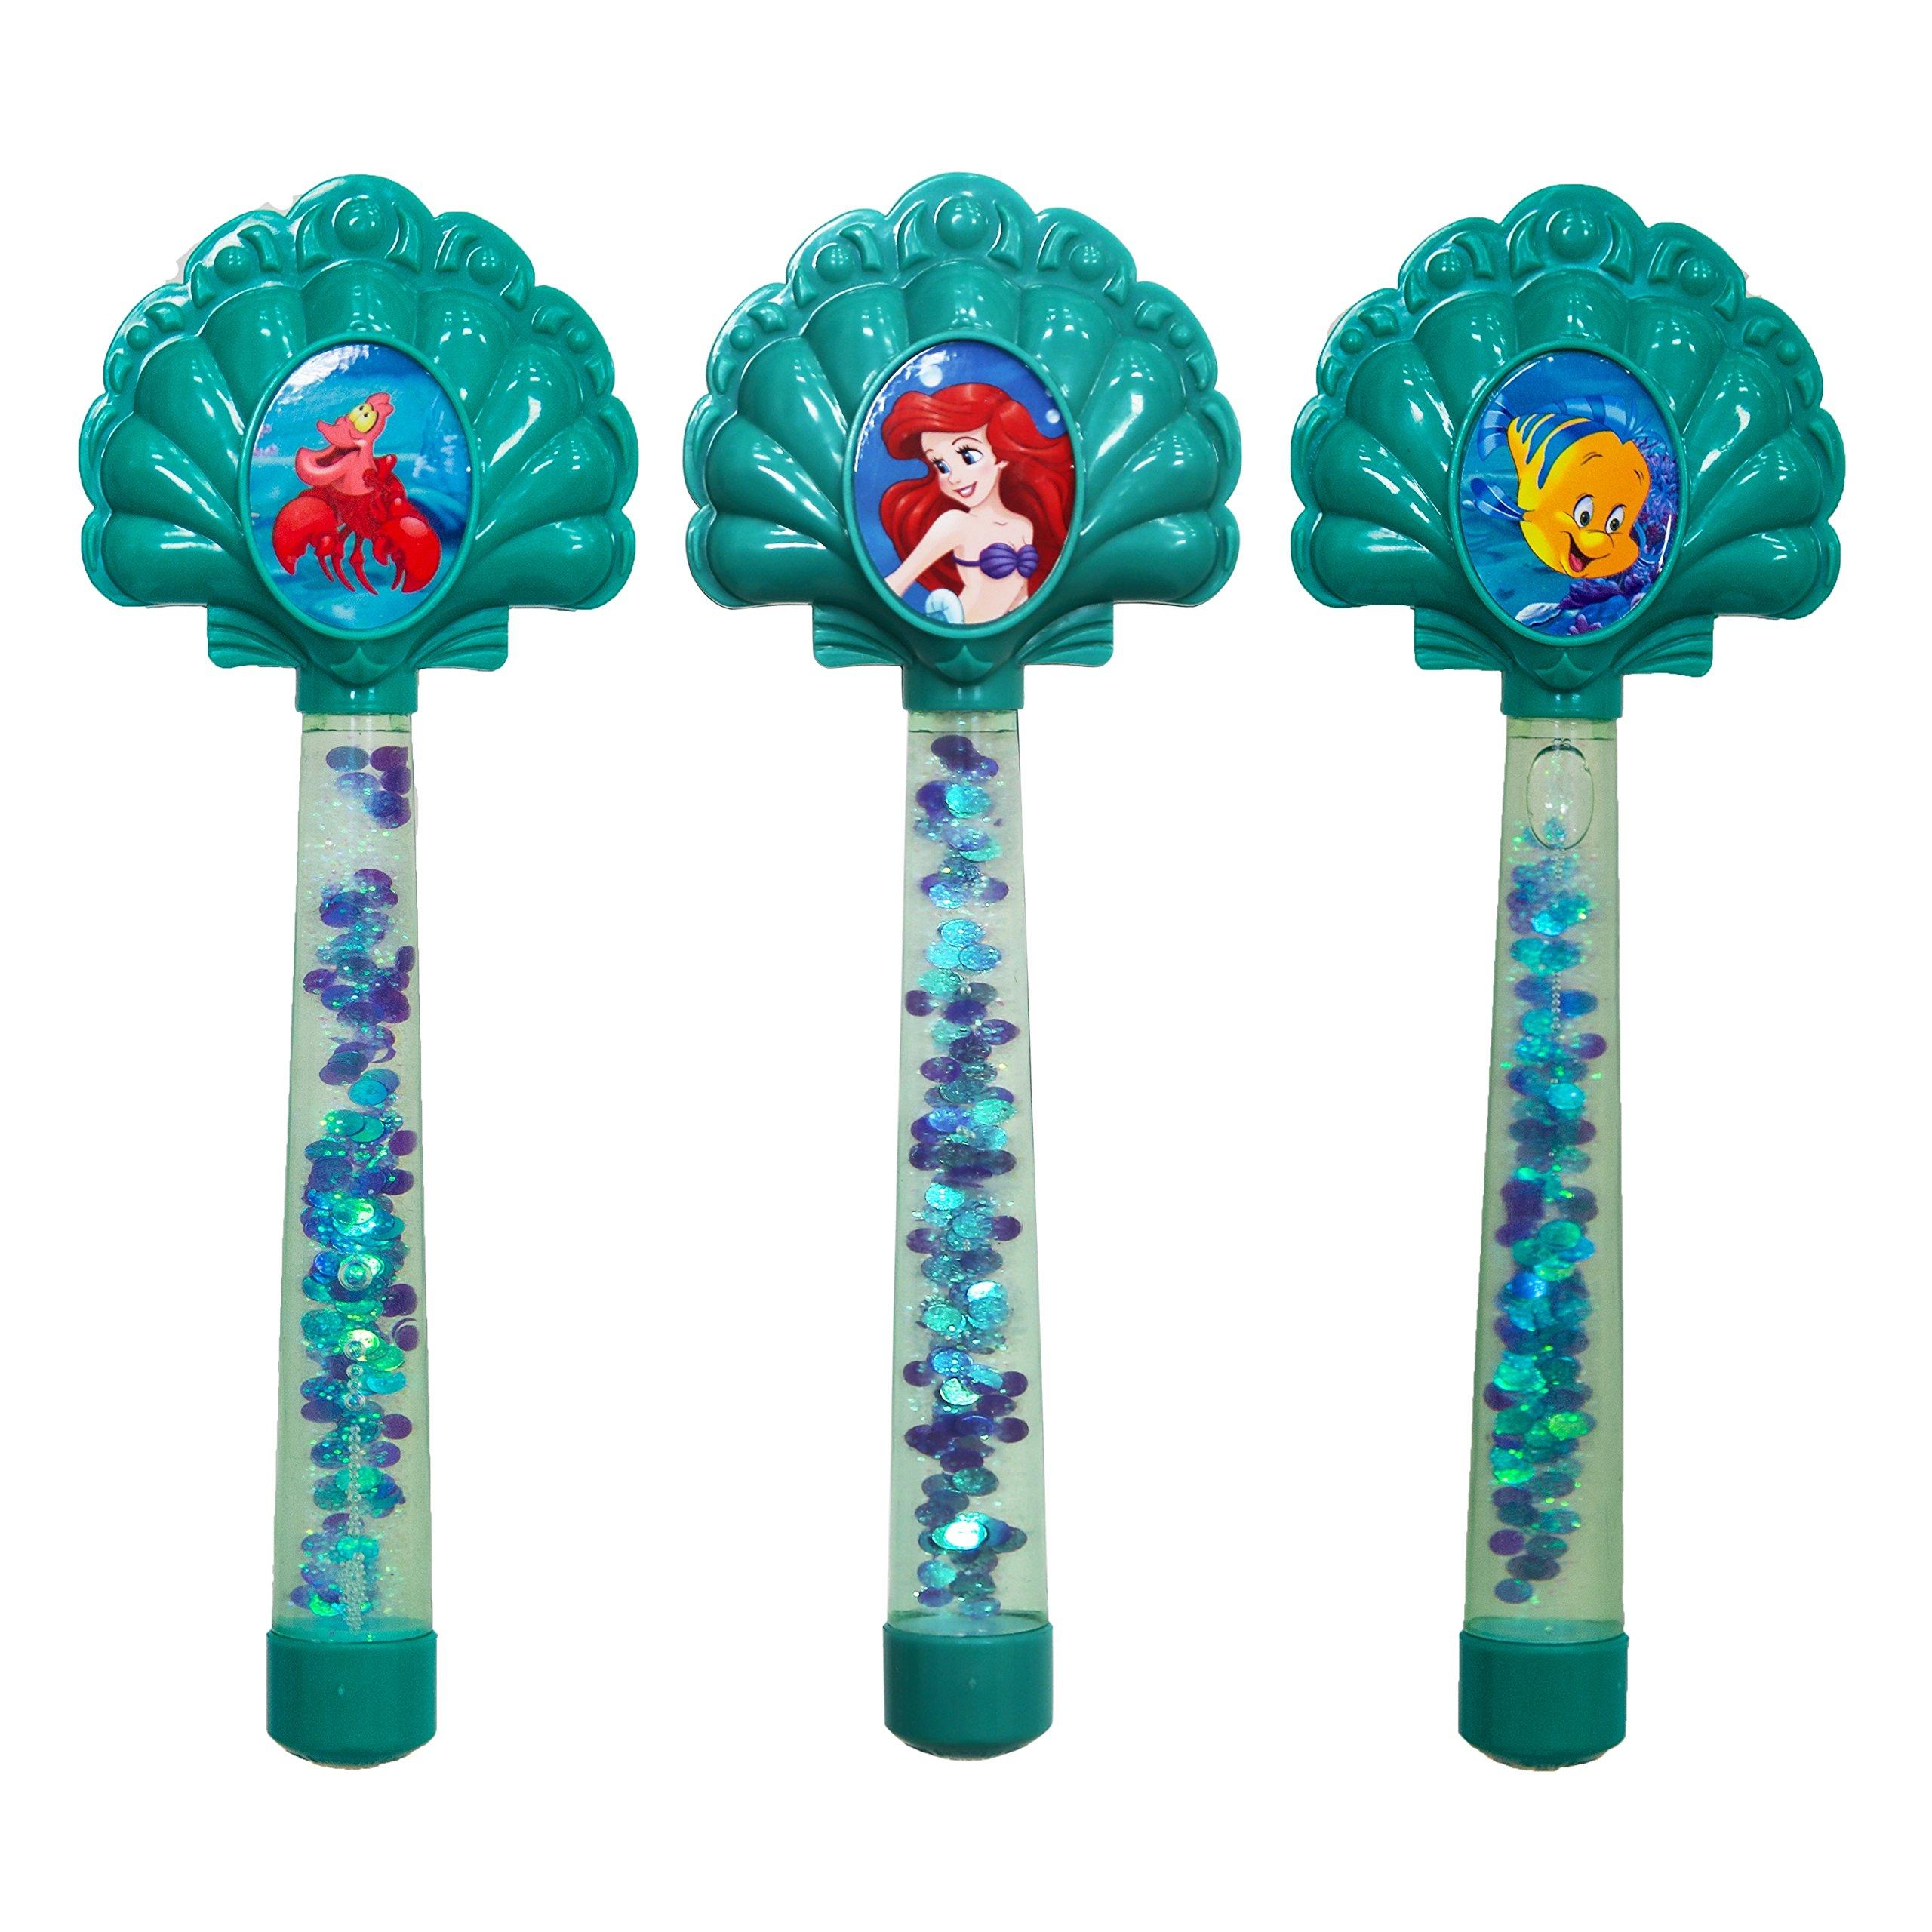 SwimWays Disney Princess Ariel Glitter Dive Wands - Pack of 3 by SwimWays